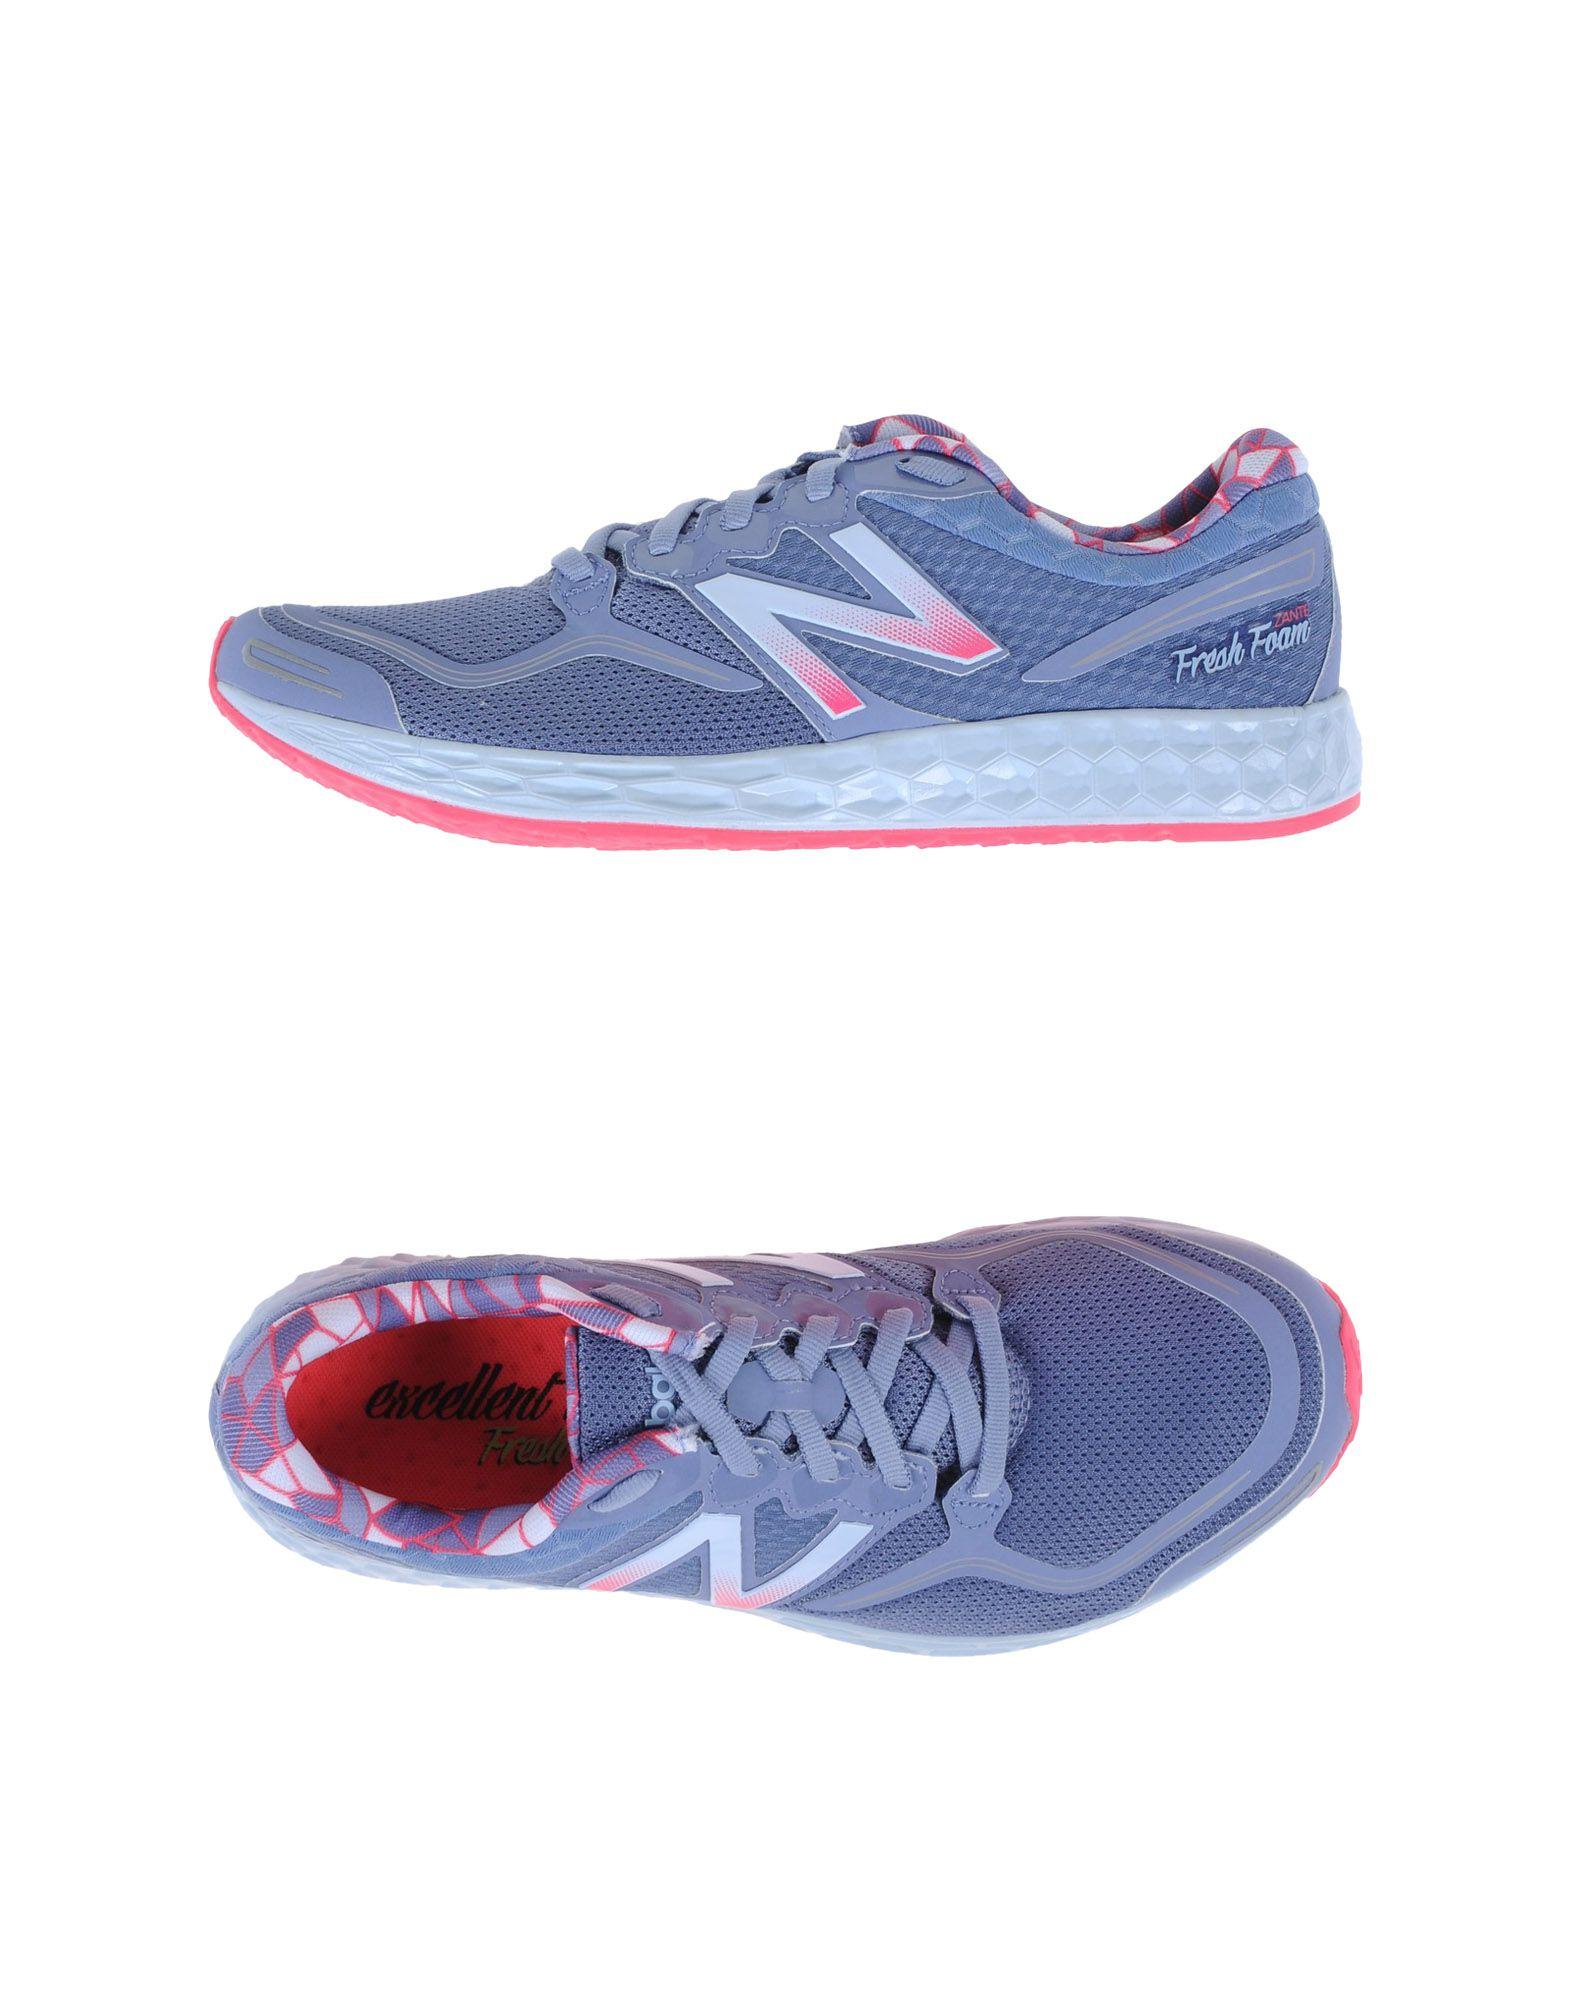 New Balance Fresh Foam Zante - Sneakers - online Women New Balance Sneakers online - on  United Kingdom - 44908164FA 141005